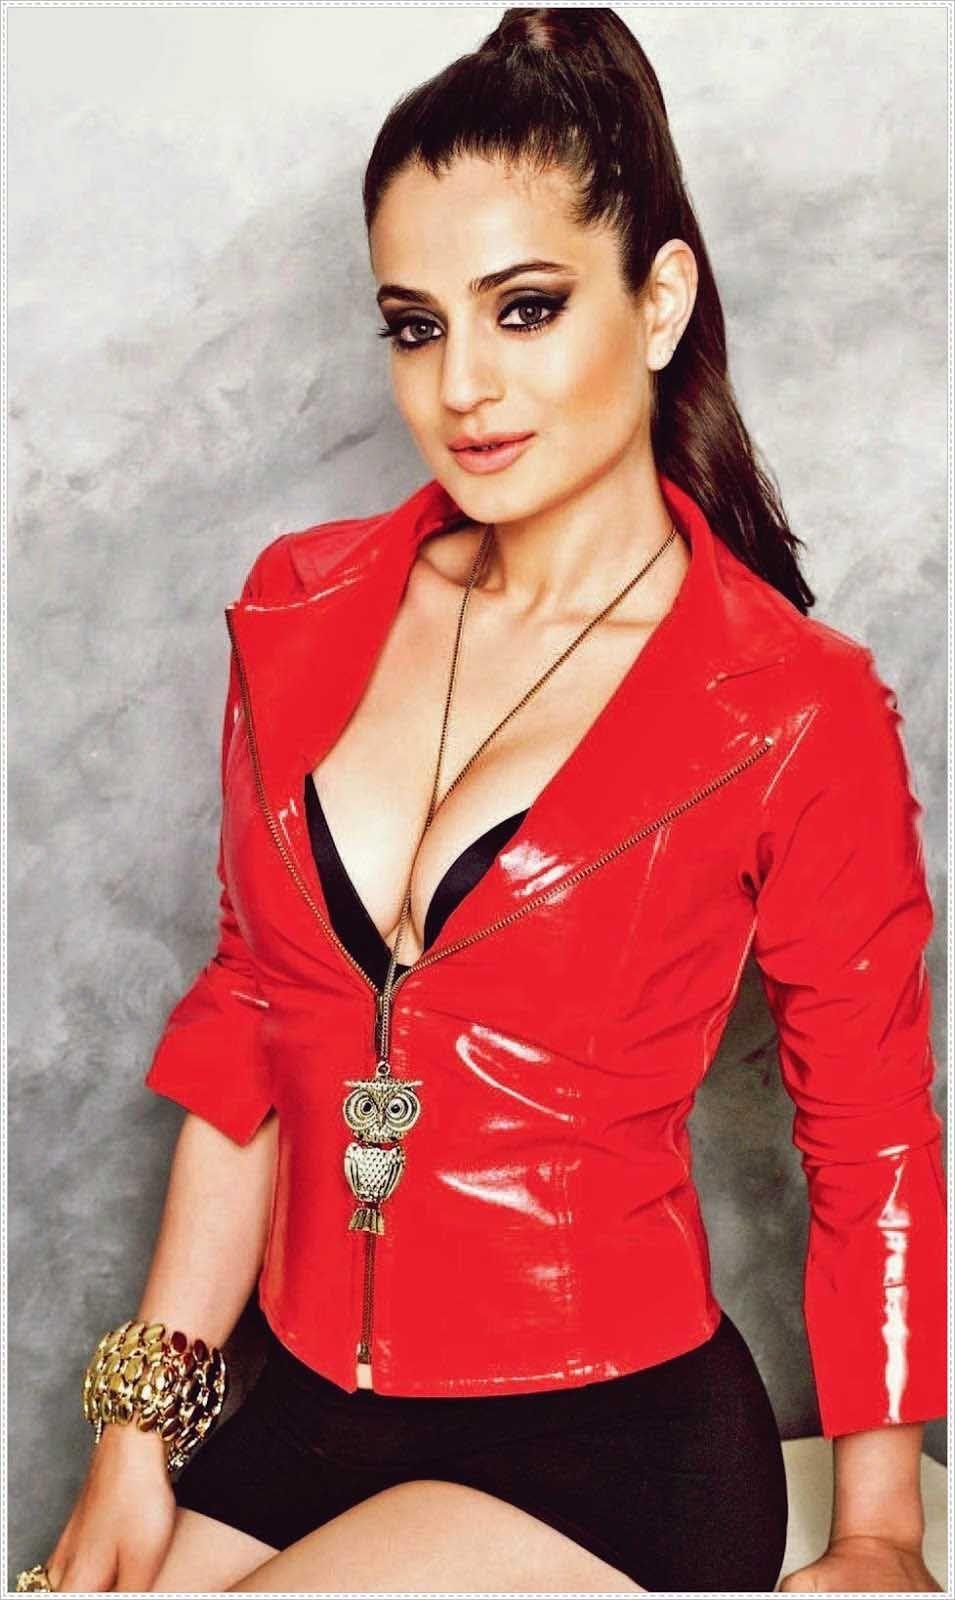 hot and sexy bollywood movie race 2 actress amisha patel very cute